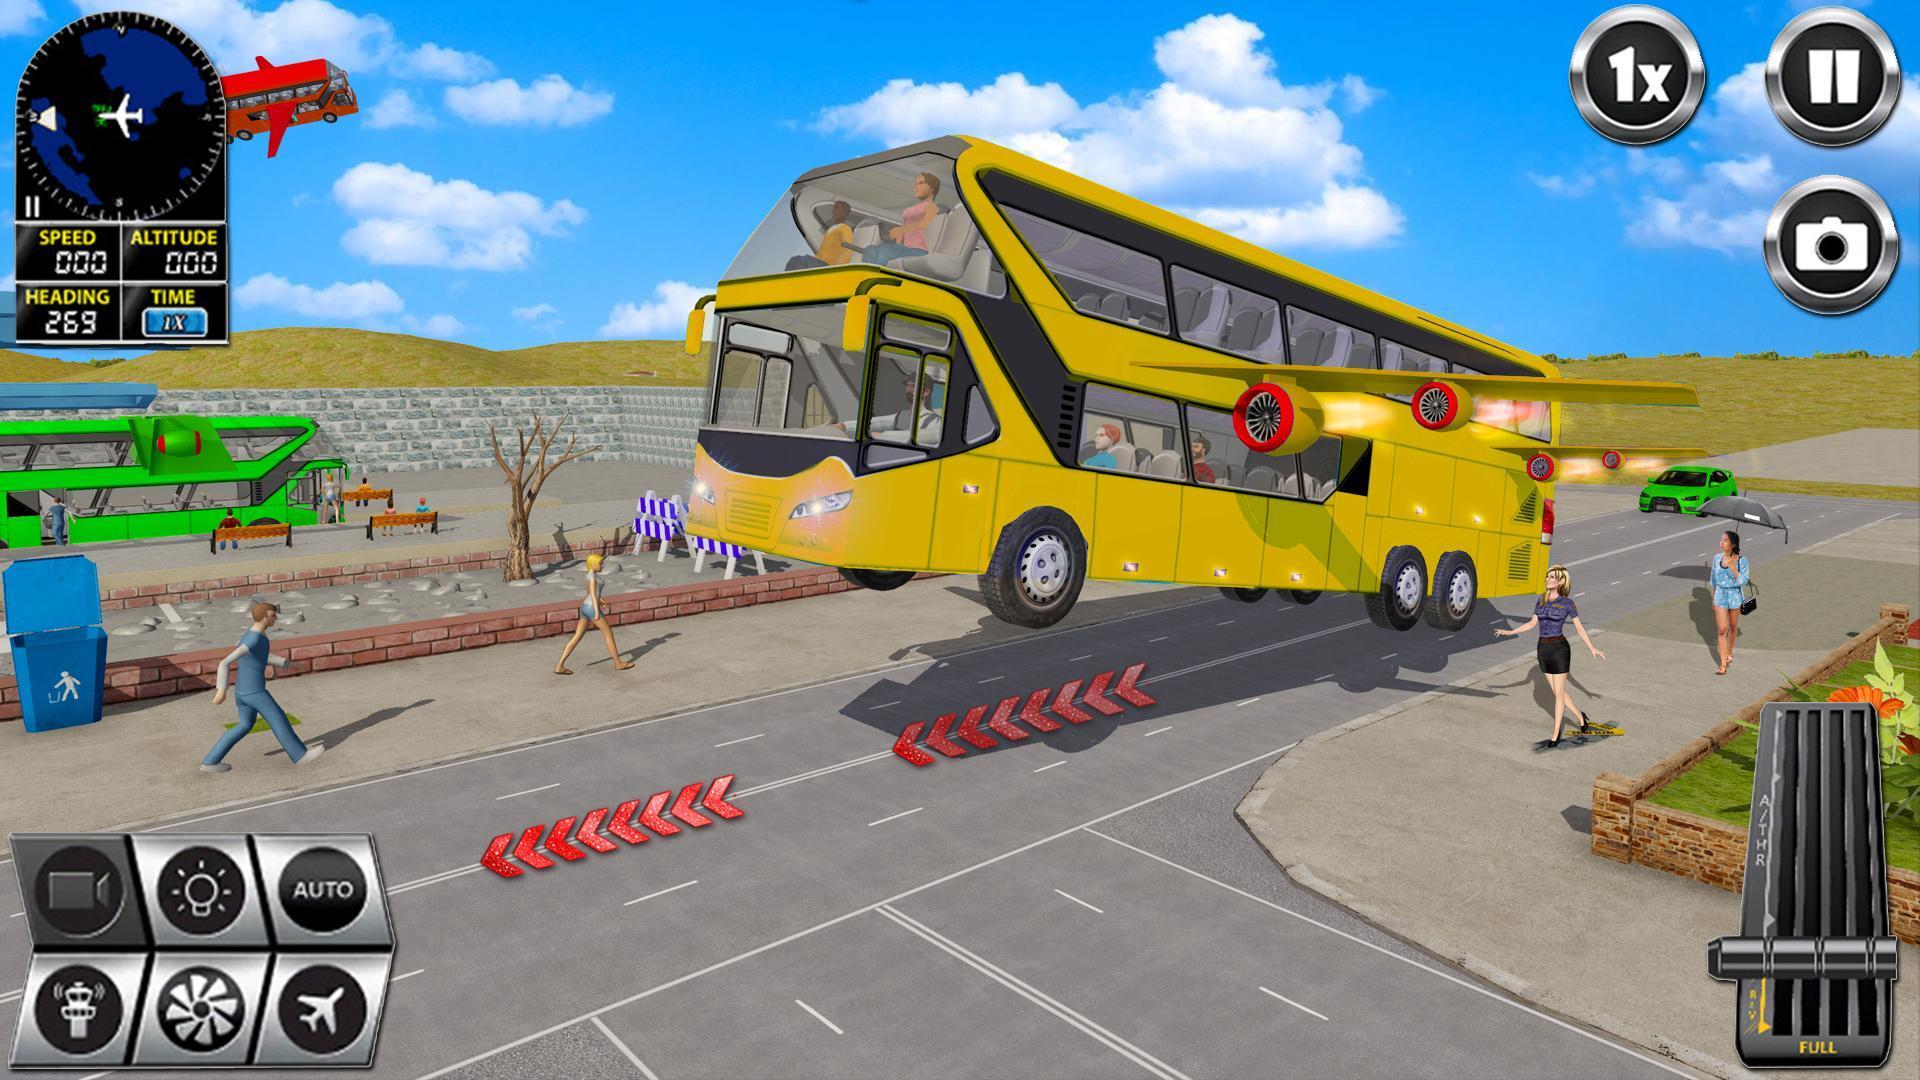 Flying Bus Driving simulator 2019: Free Bus Games 2.8 Screenshot 14